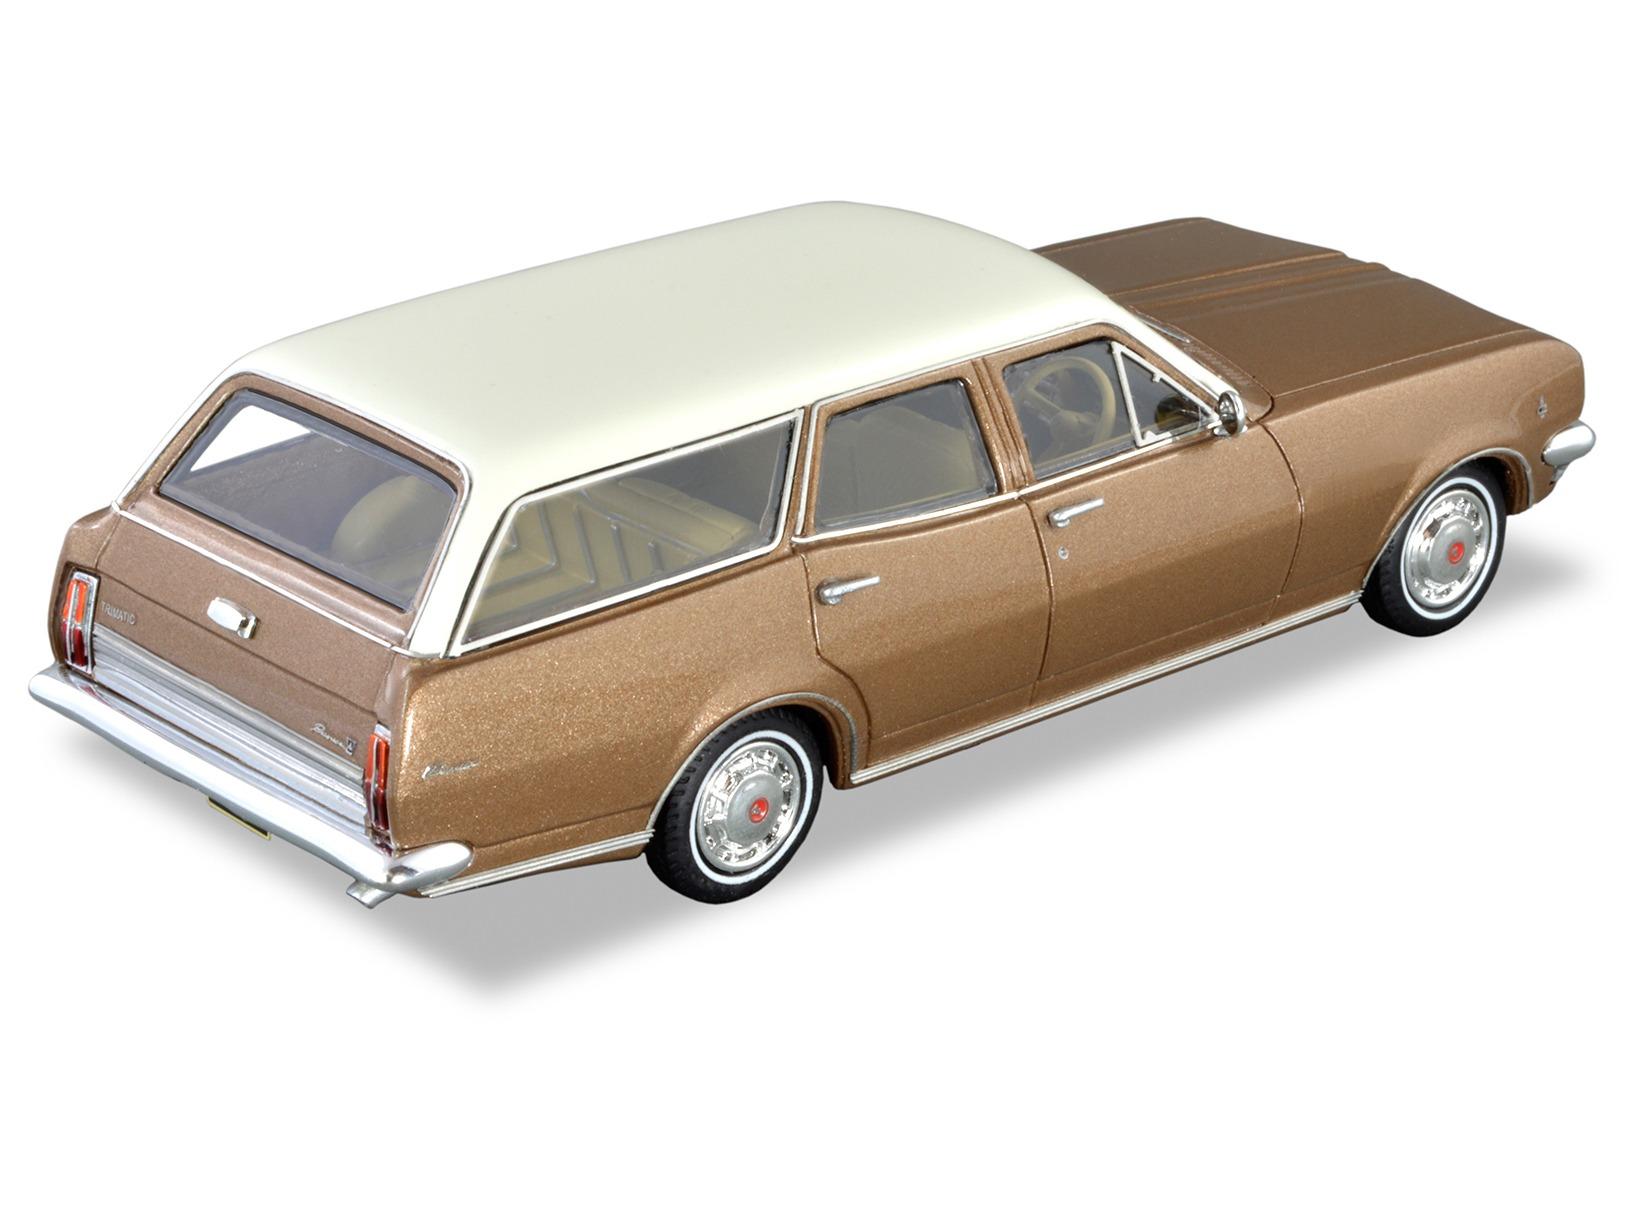 1970 HG Premier Wagon  – Cameo Gold / Kashmir White